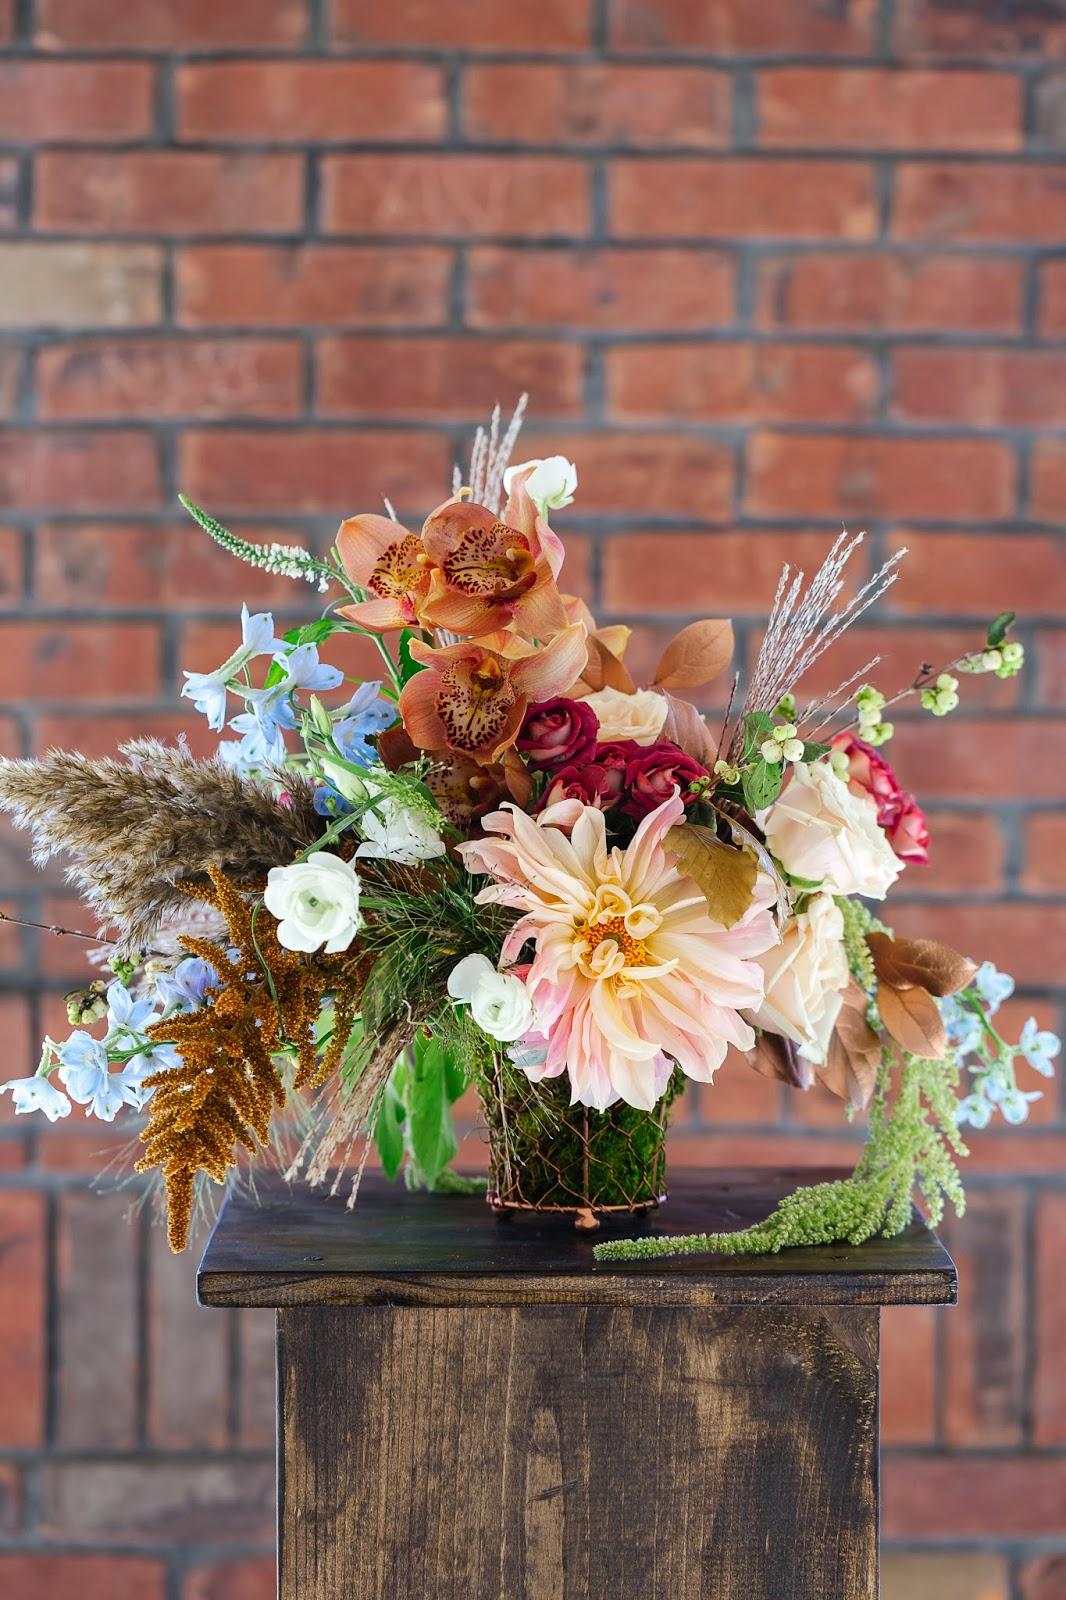 fall wedding centerpiece copper floral utah florist centerpieces orchids flowers gold branches event cafe grass sahara roses dinner peach ranunculus